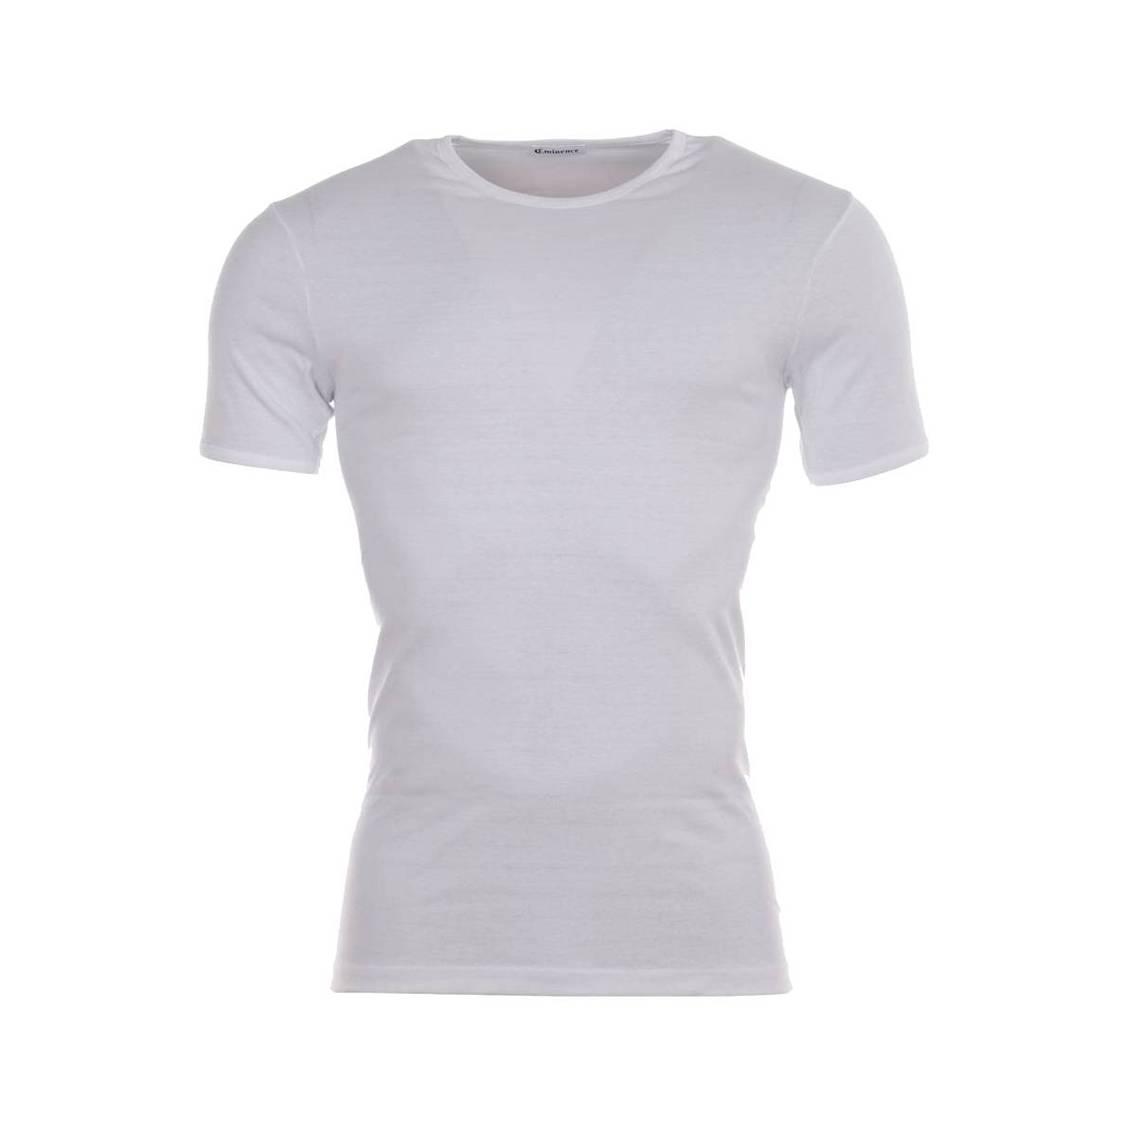 Tee-shirt col rond  en coton blanc